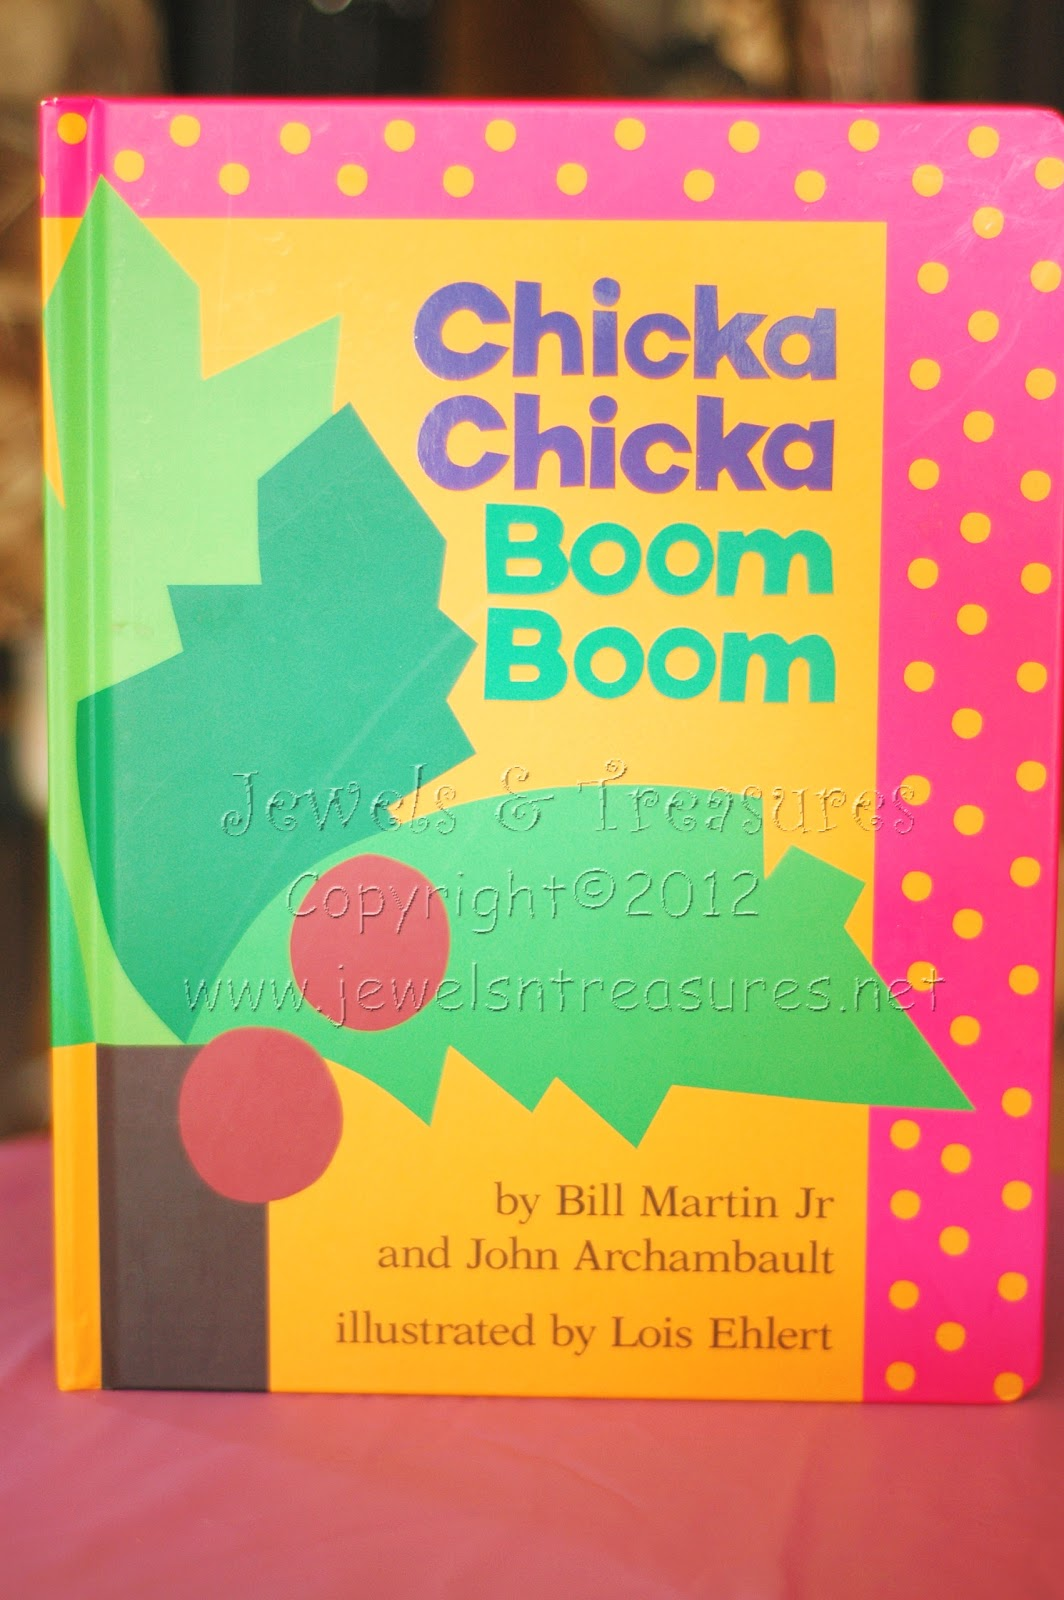 Jewels & Treasures: Chicka Chicka Boom Boom Birthday Party - photo#8